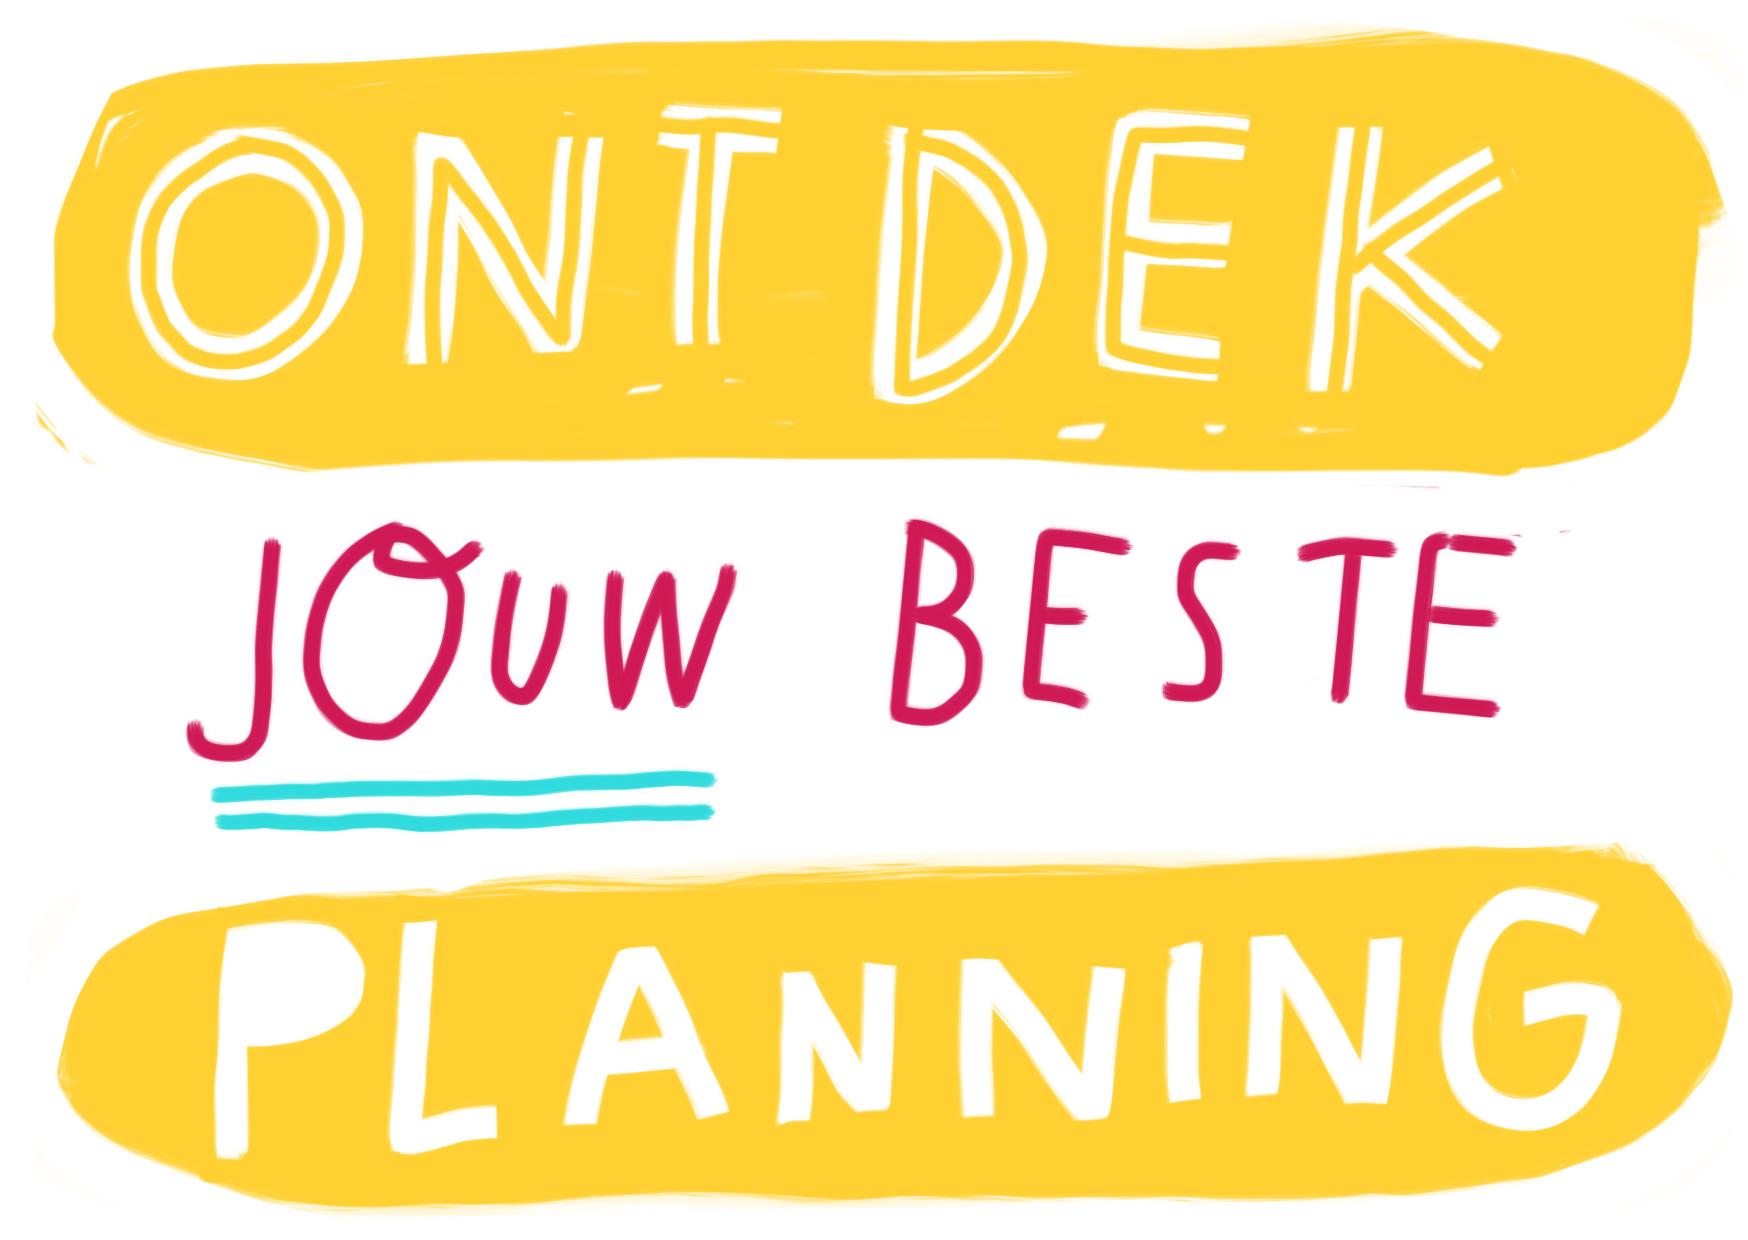 beste planning ondernemer